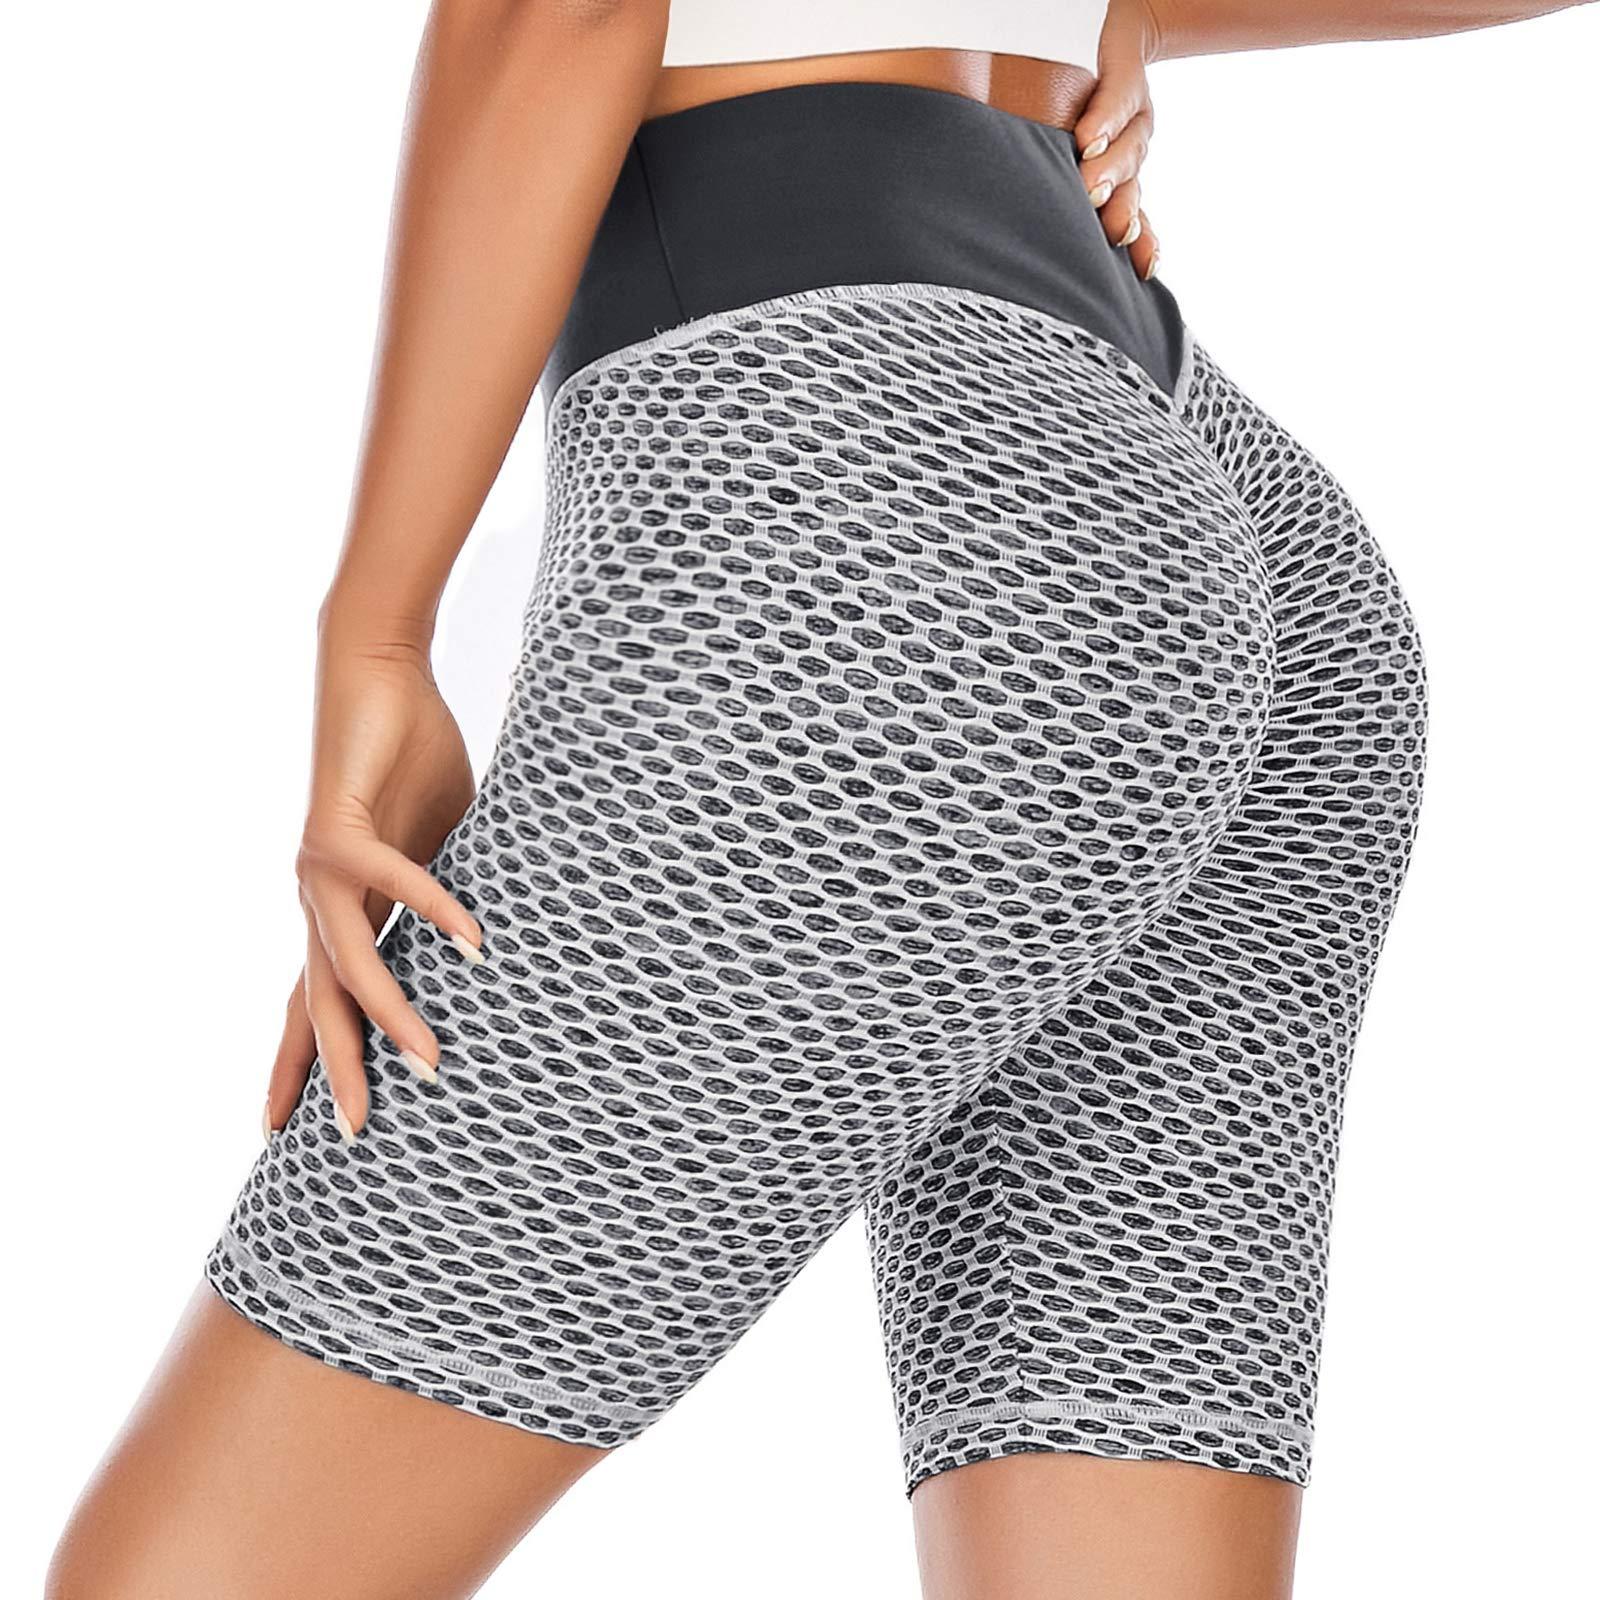 YEYELE Yoga Shorts for Women High Waist Butt Scrunch Booty Spandex Gym Workout Running Biker Shorts